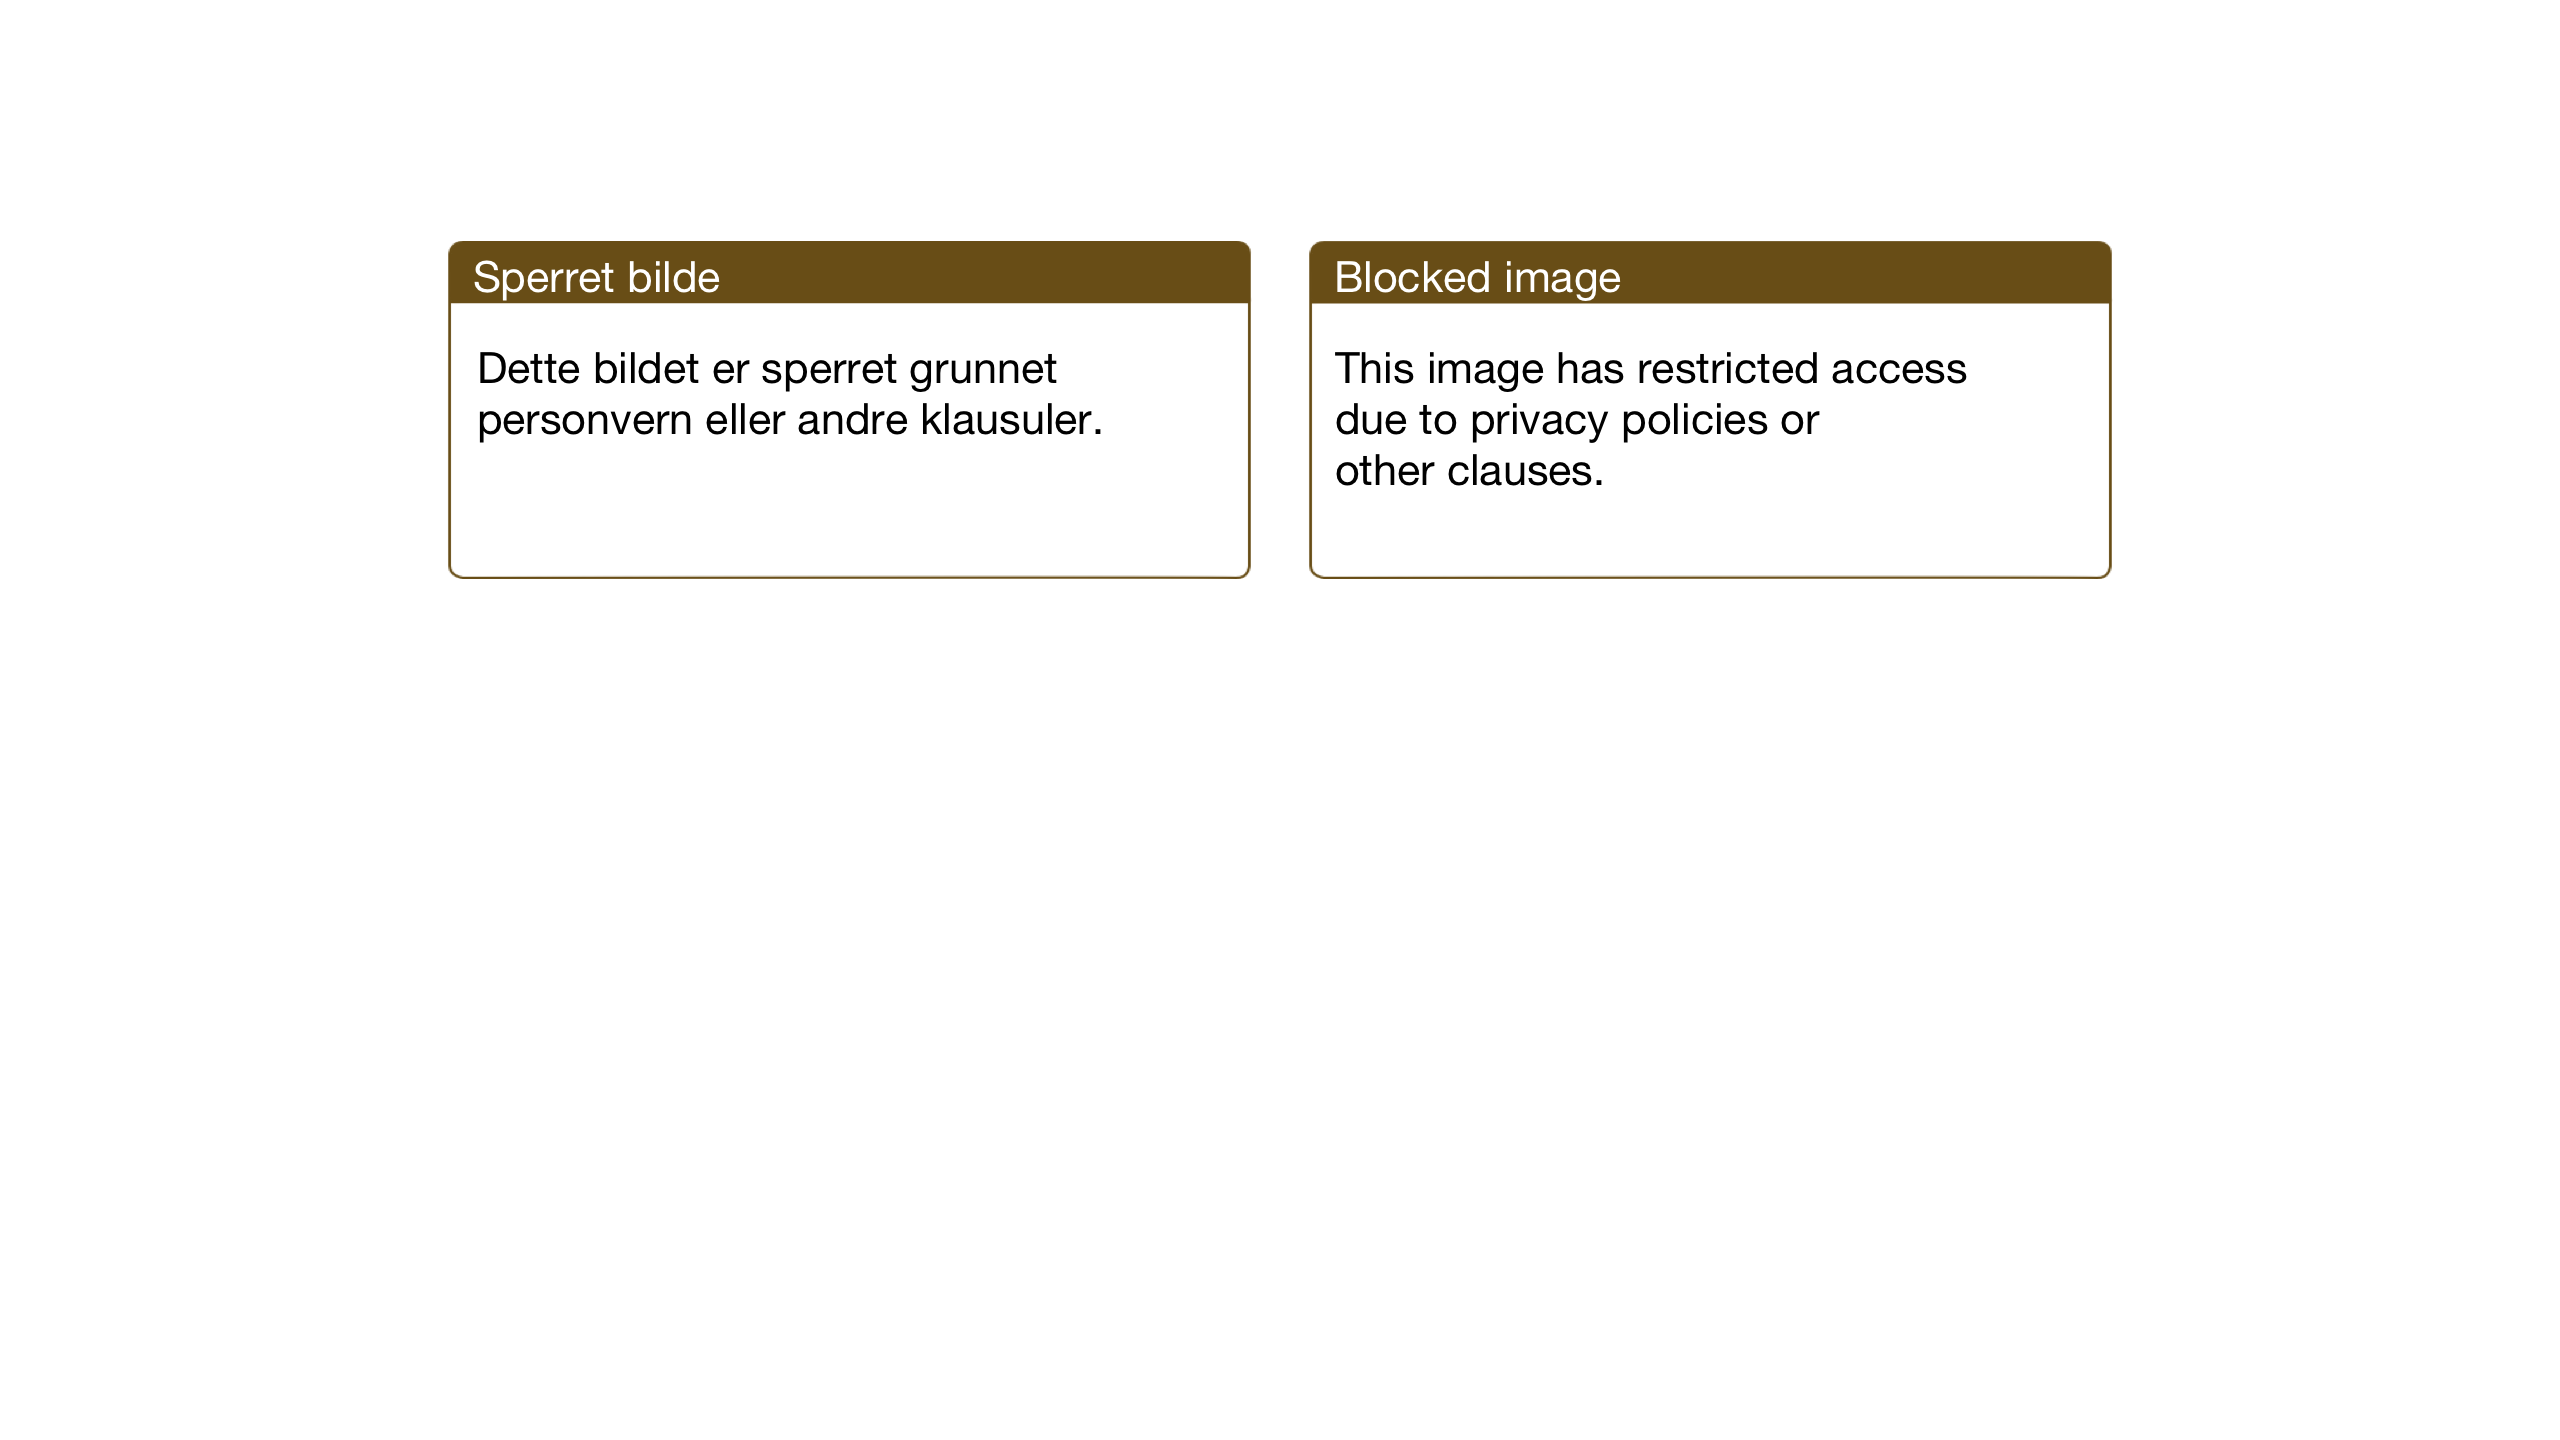 RA, Justisdepartementet, Politiavdelingen (RA/SDJ-6873), 1999, s. 1